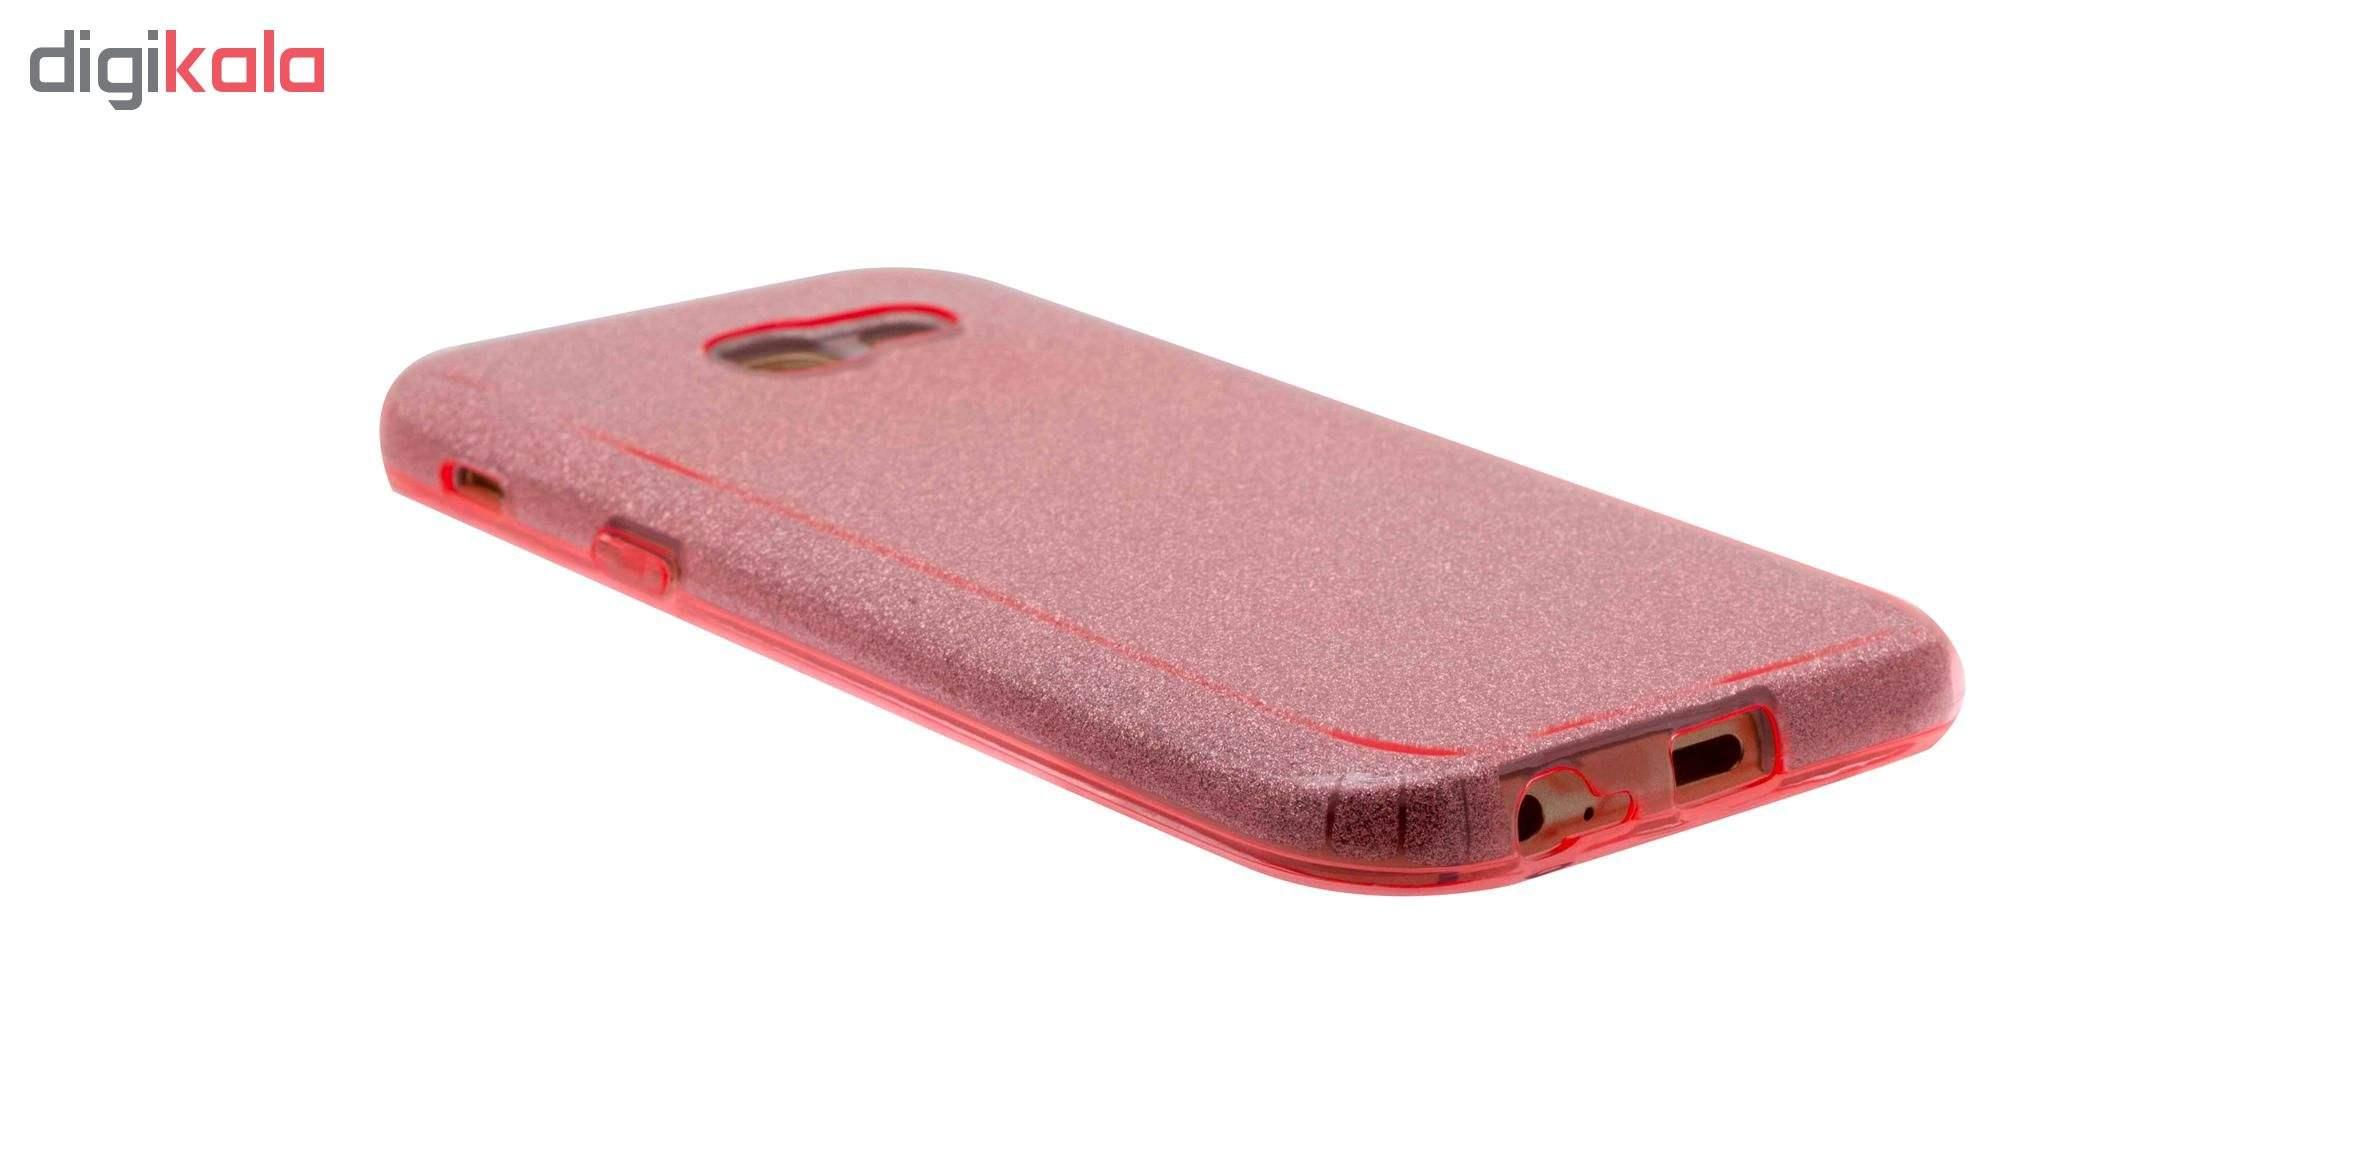 کاور مدل CORONA طرح اکلیلی مناسب برای گوشی سامسونگ گلکسی A5 2017 / A520 main 1 19